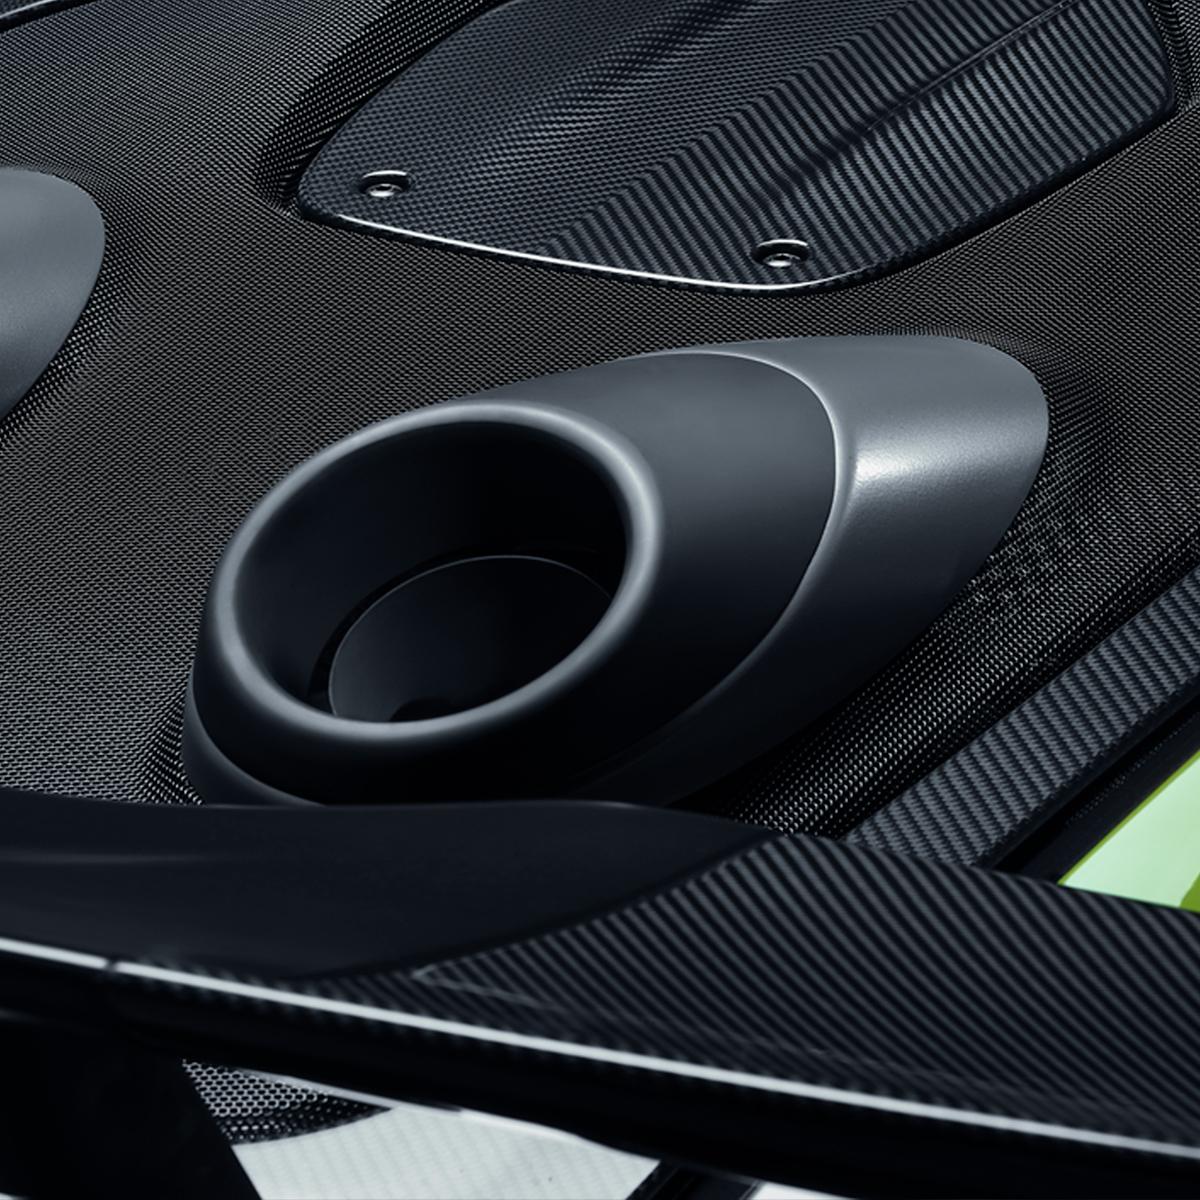 Mclaren 600lt Spider Design Mclaren Automotive